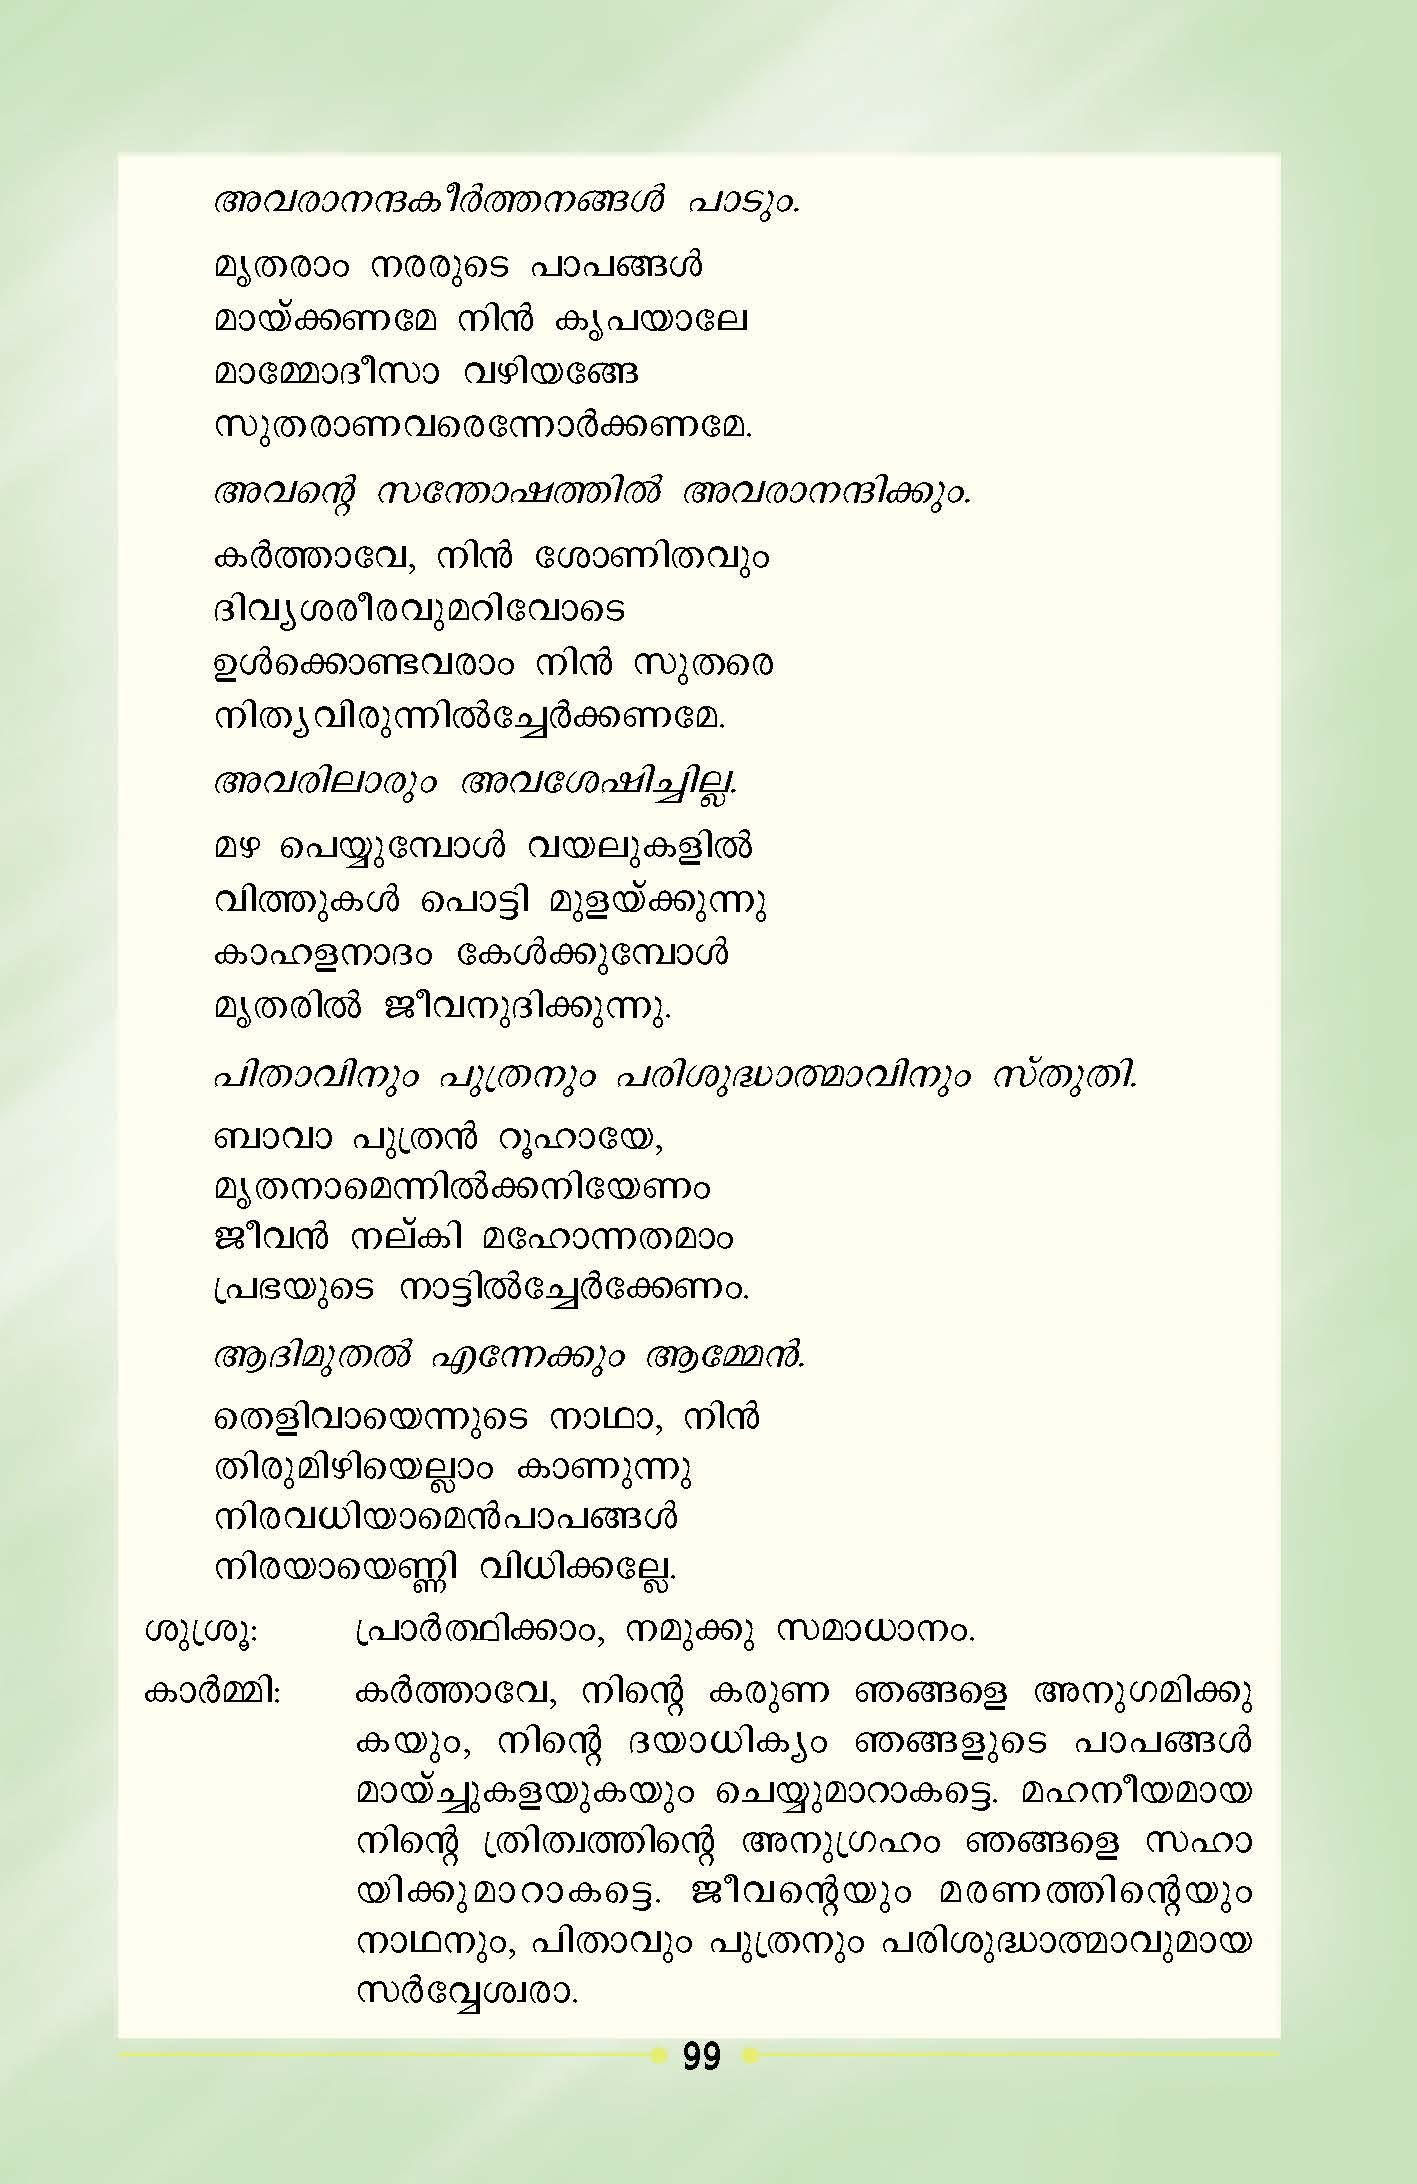 Cheriya Oppesu Office for the Dead (Malayalam) 02